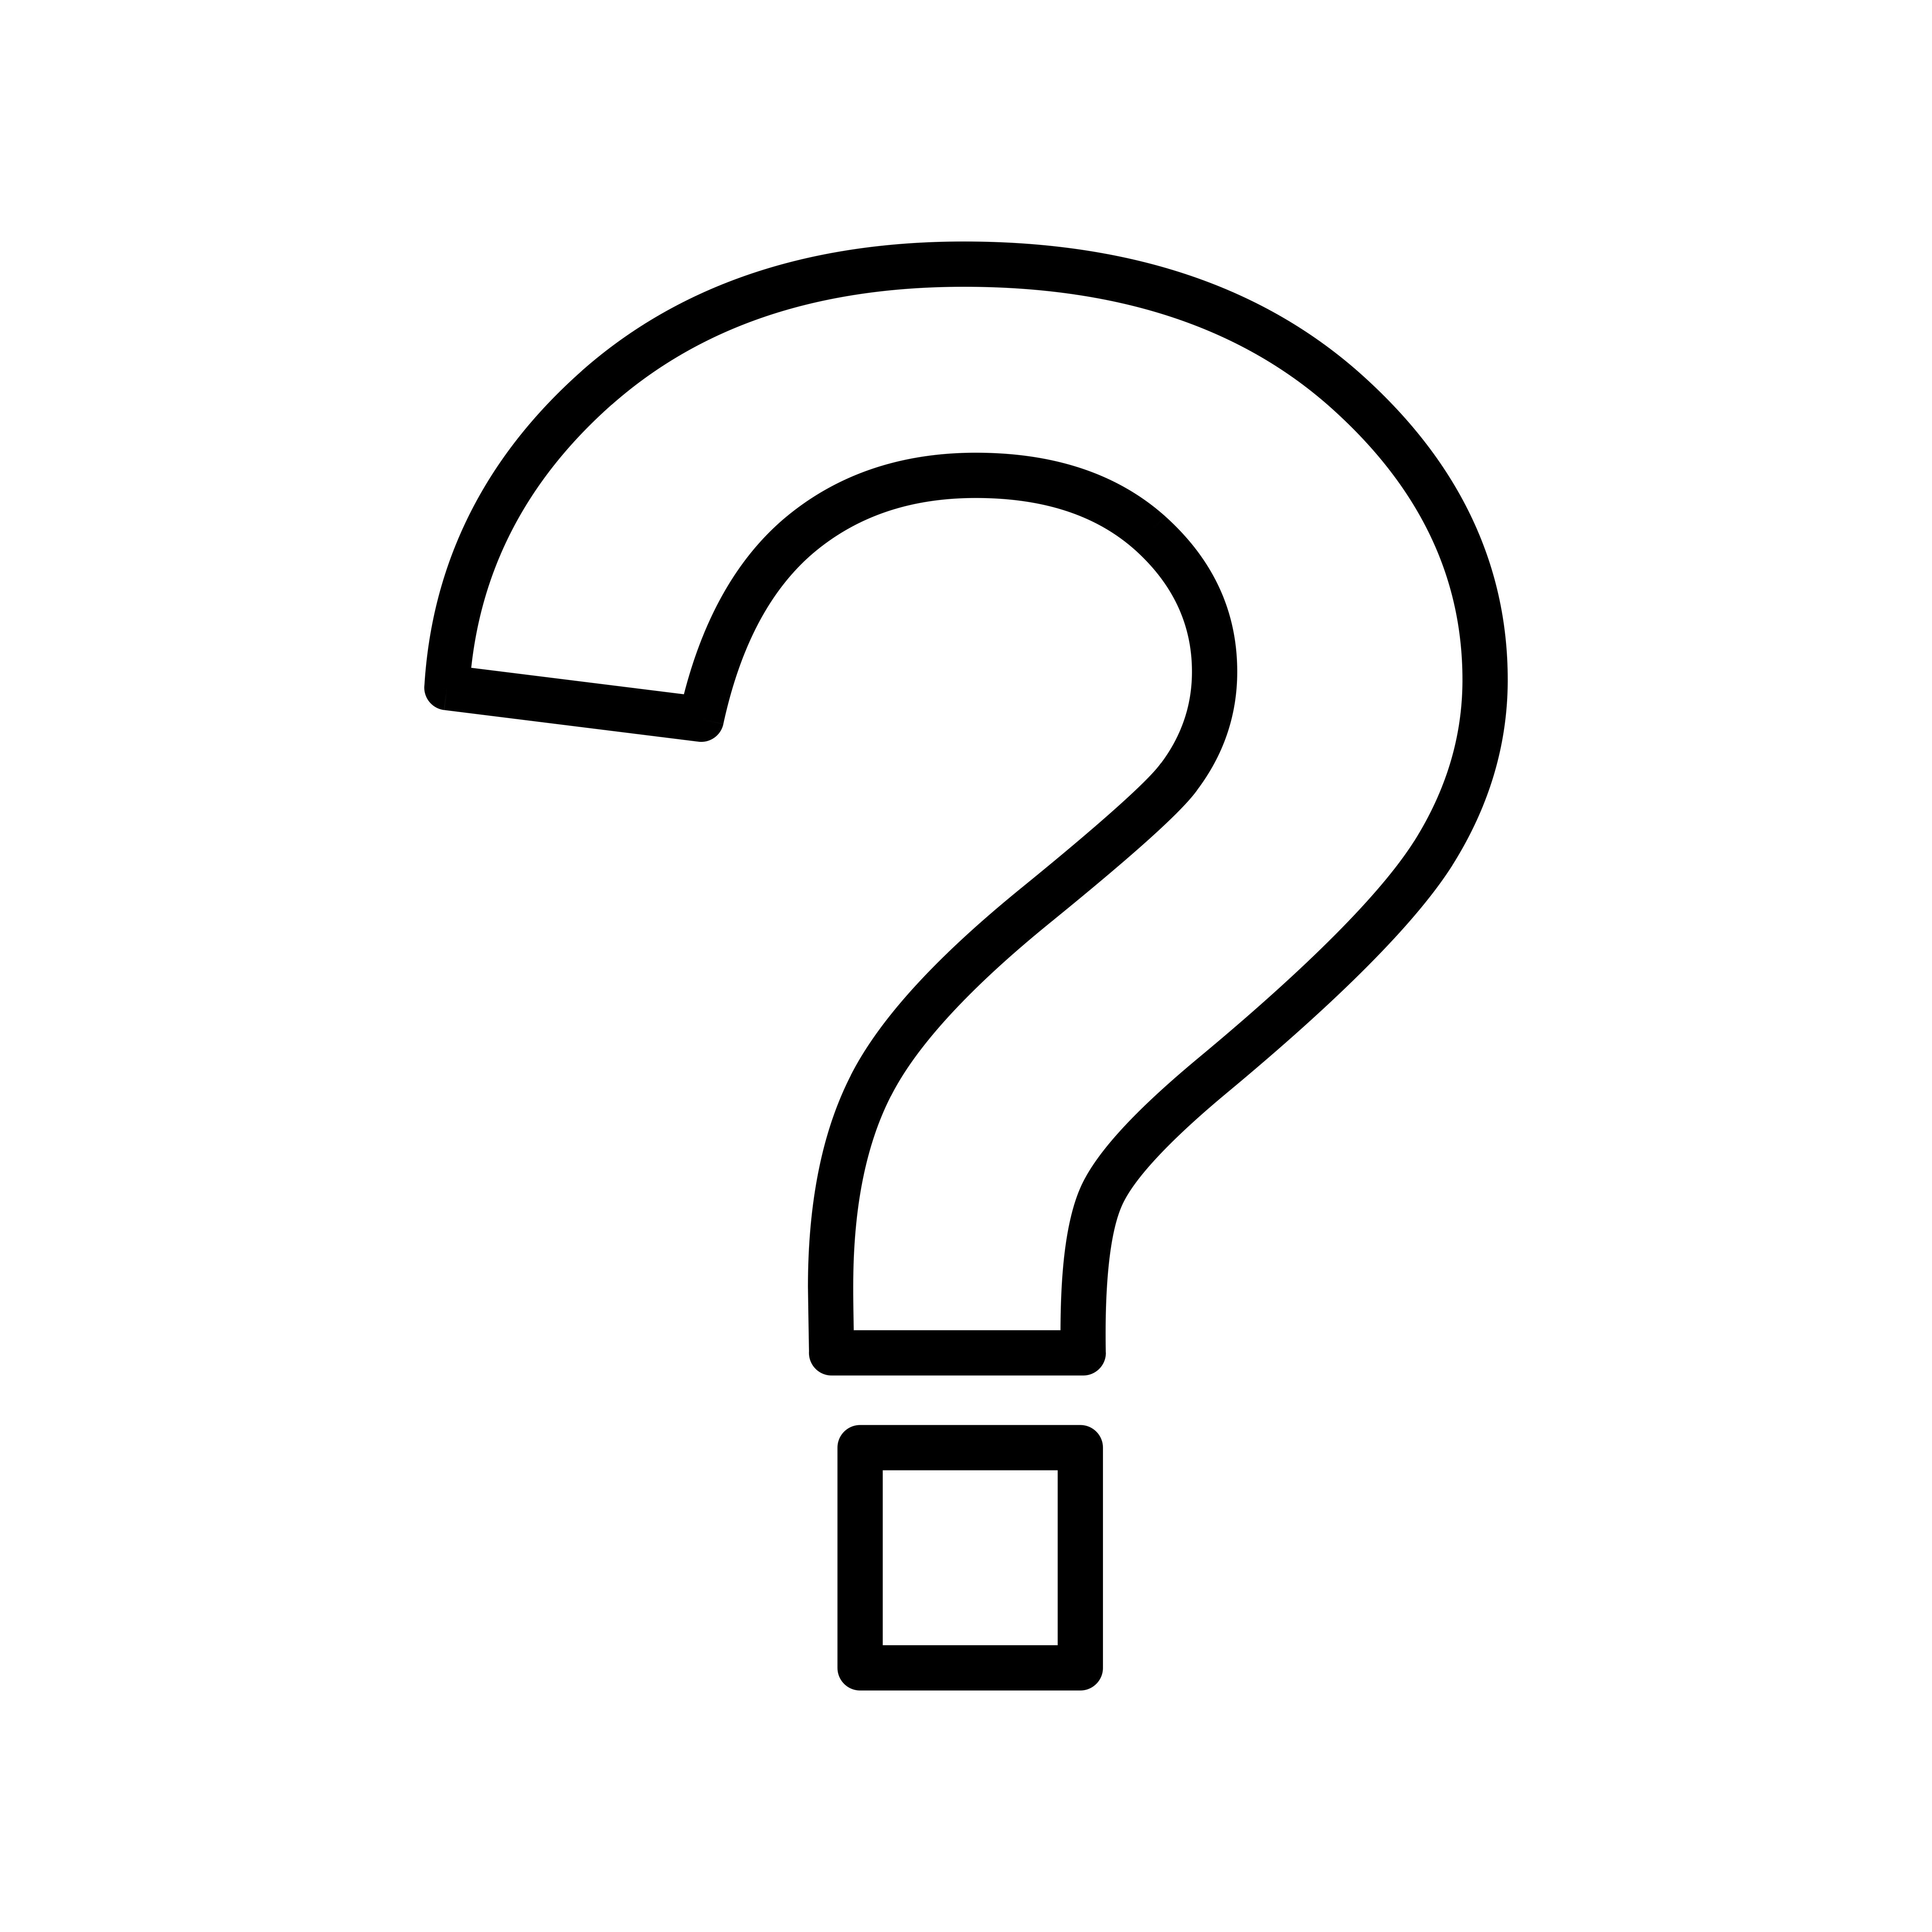 Question Mark Vector Icon